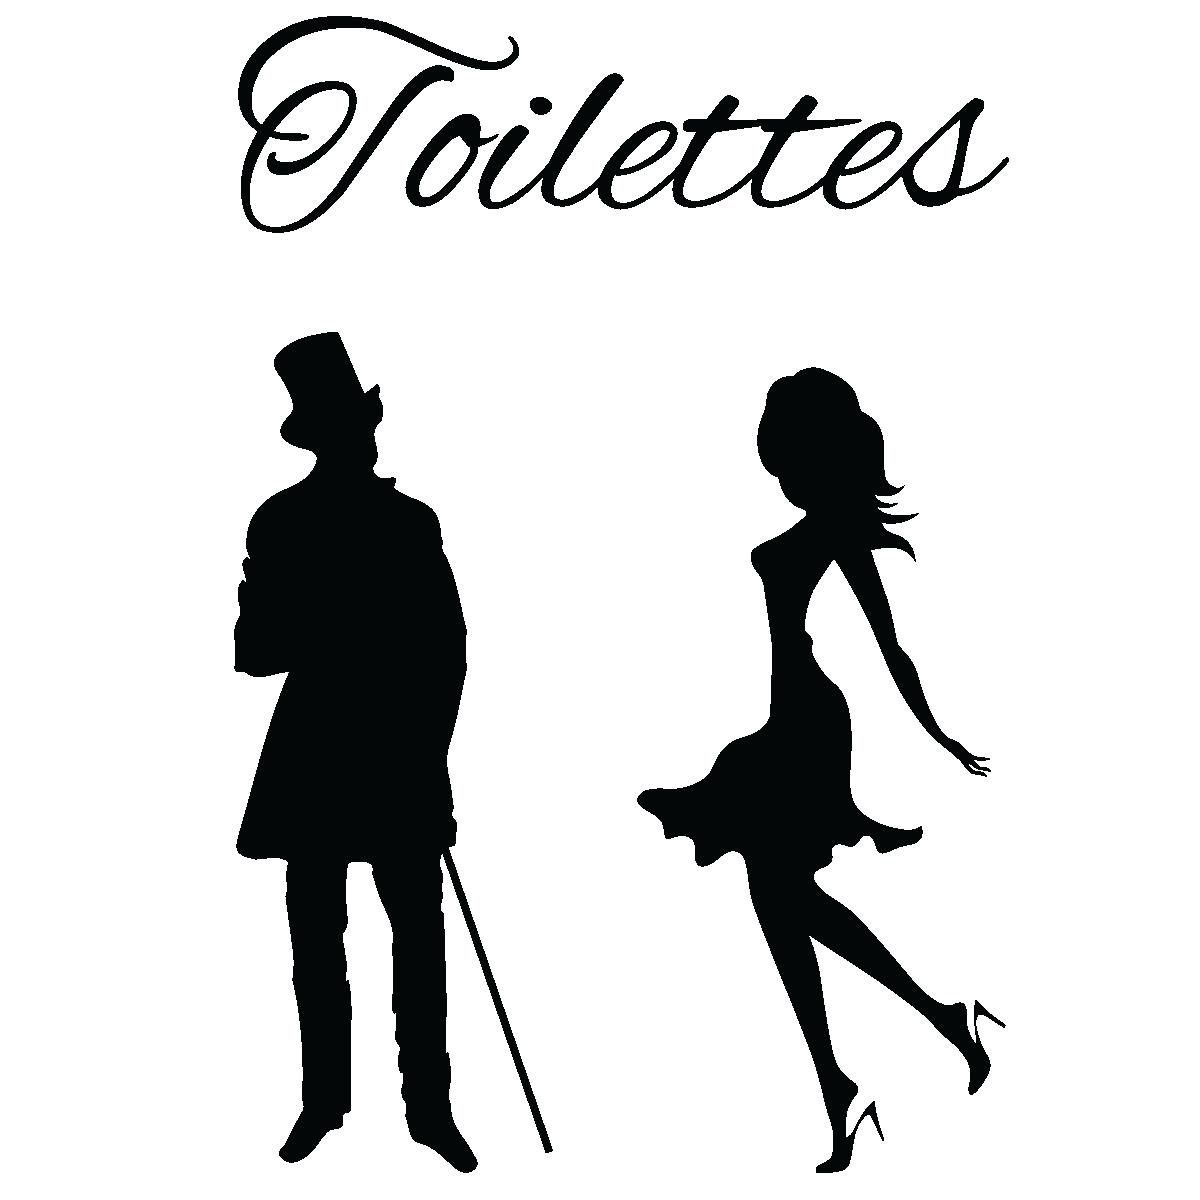 sticker porte toilettes silhouettes homme et femme stickers toilettes porte ambiance sticker. Black Bedroom Furniture Sets. Home Design Ideas